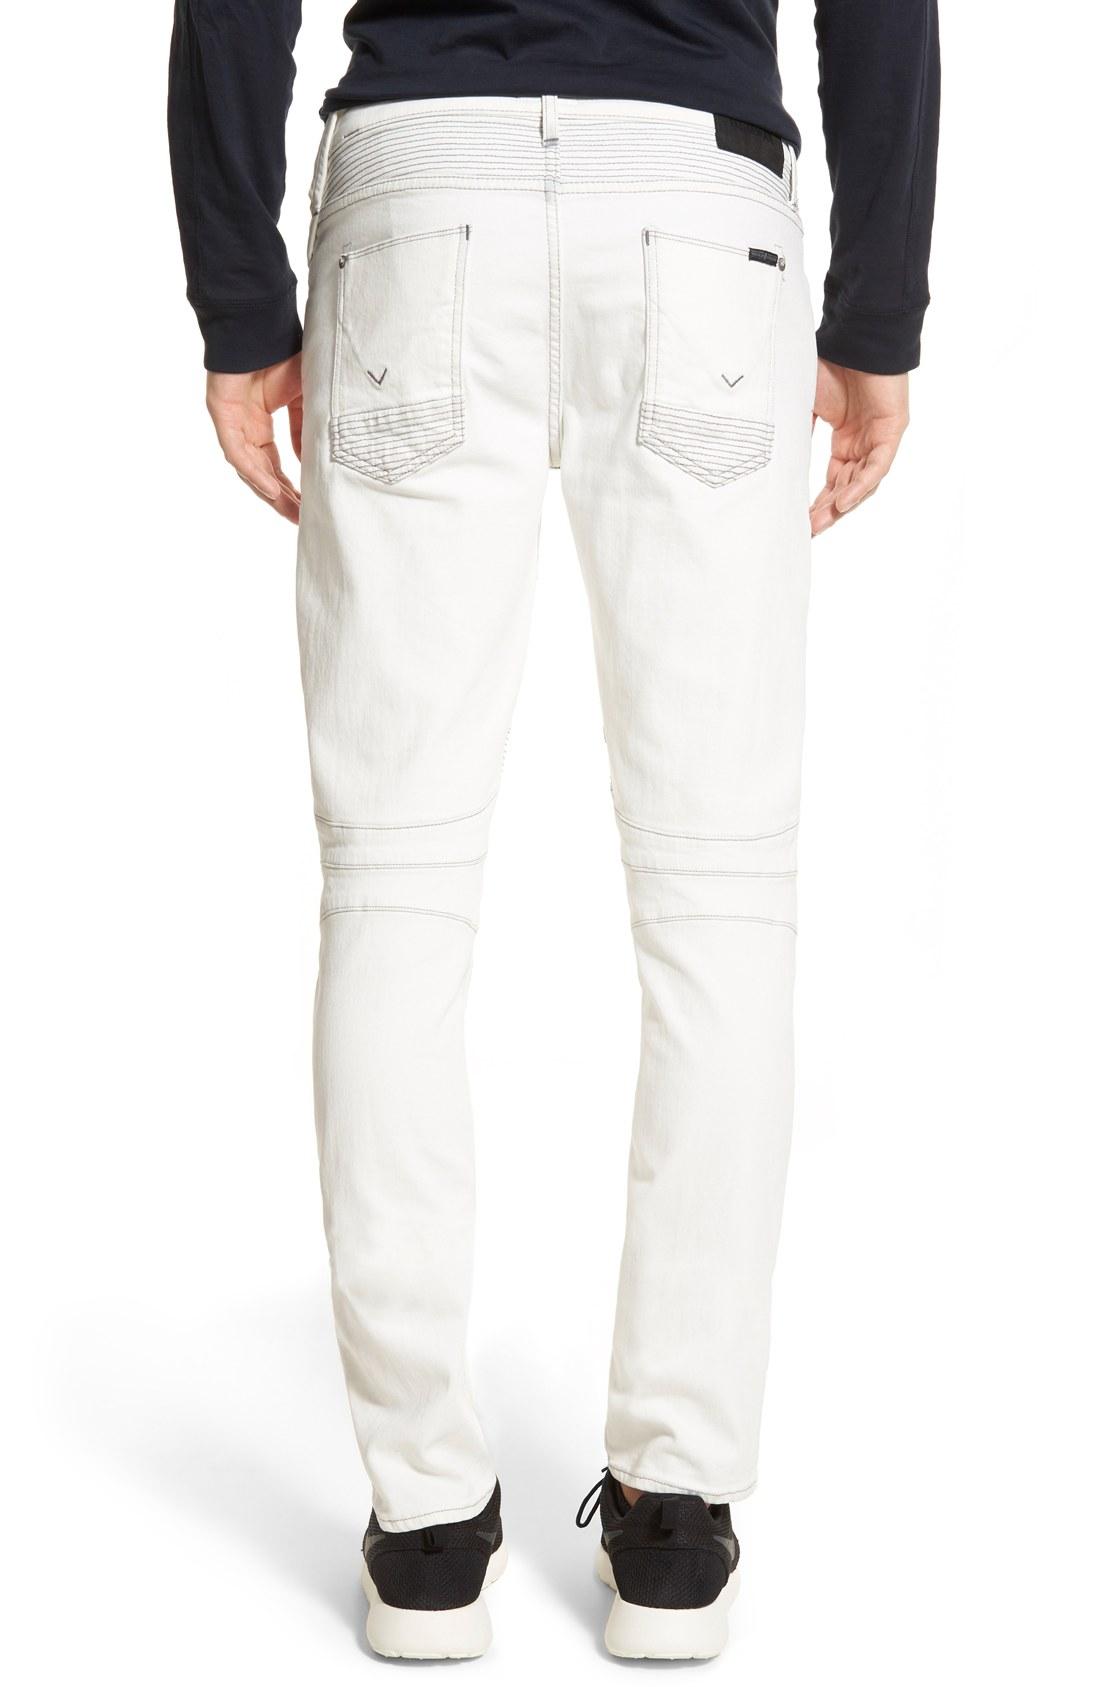 Hudson-Blender-Skinny-Fit-Moto-Jeans-Peroxide-2